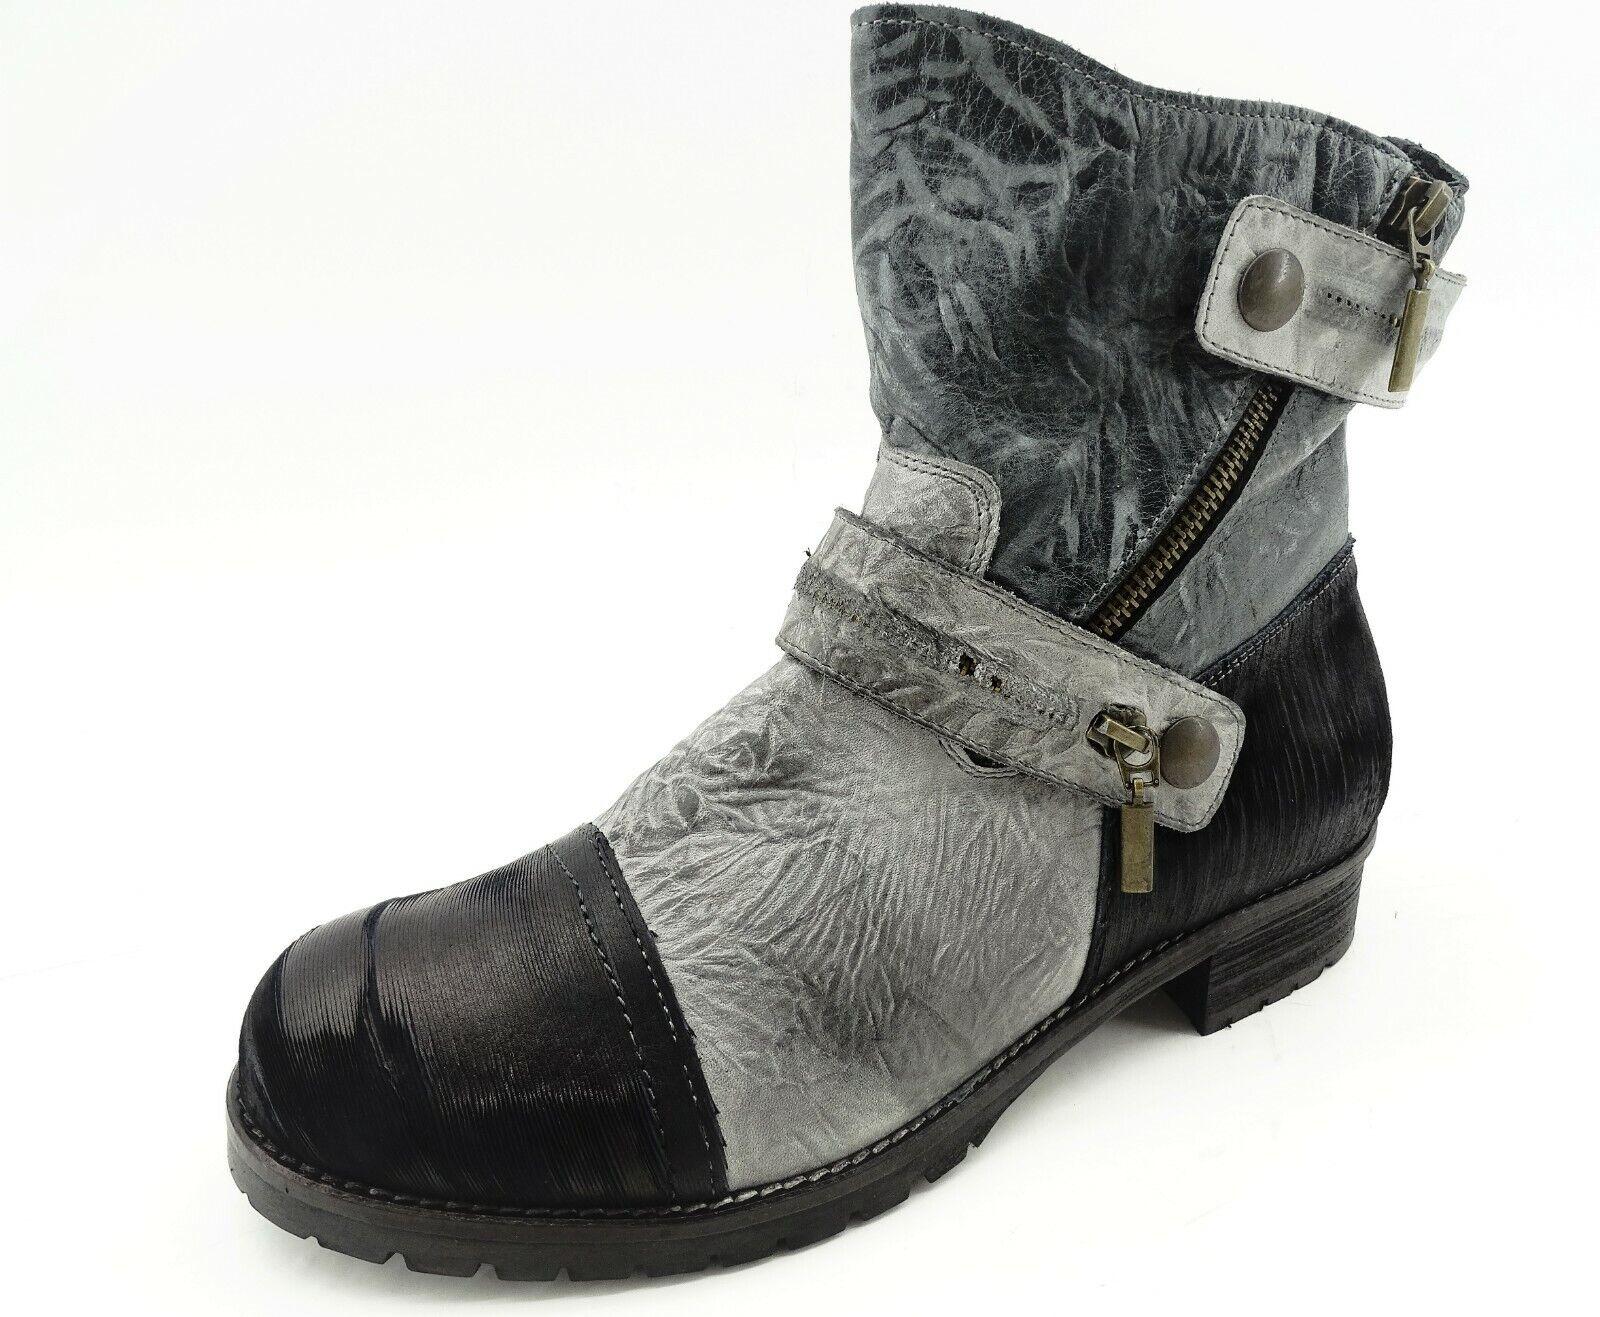 Galapagos schuhe schwarz Damen Used-Look Stiefel Stiefel Stiefeletten Leder Gr 39